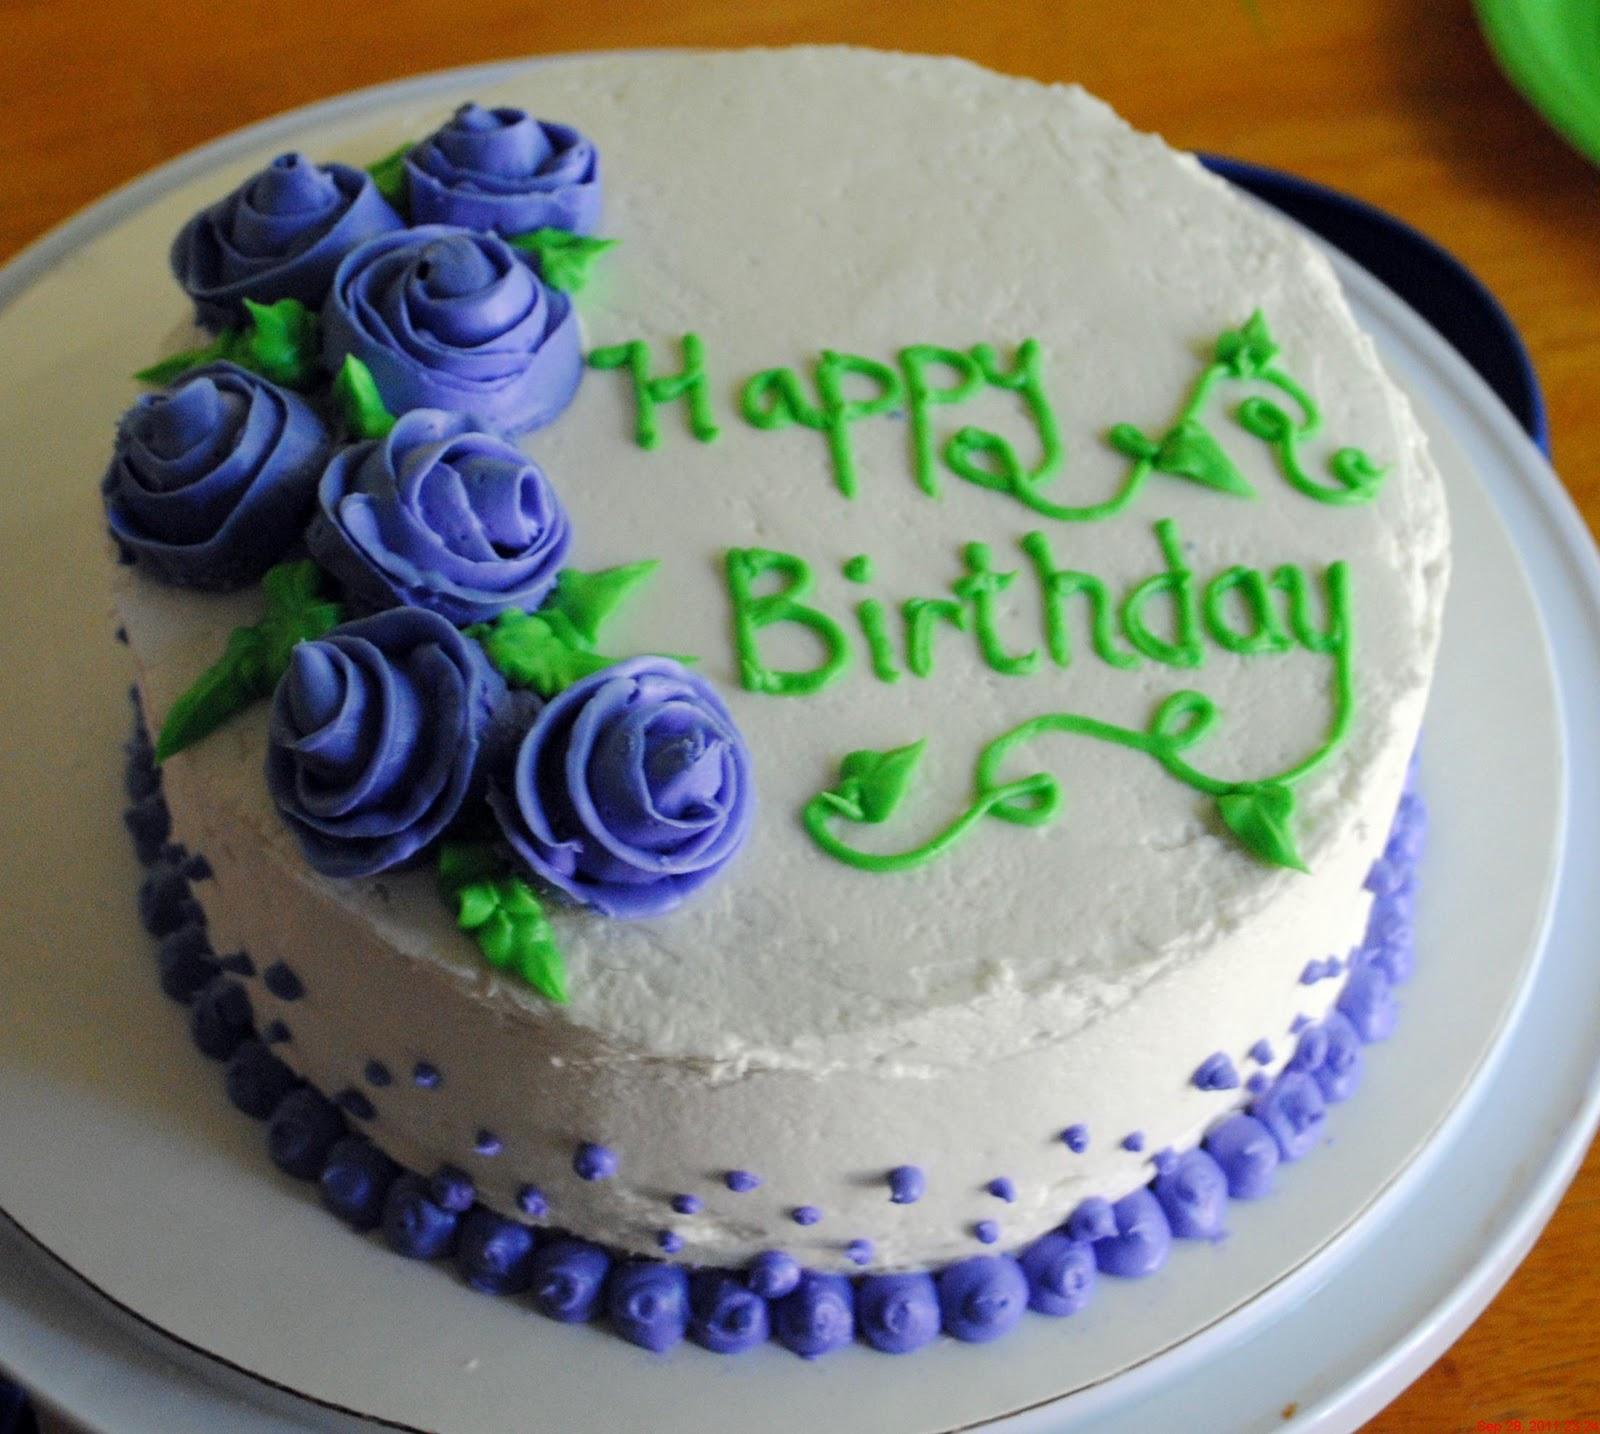 Wilton Cake Classes Hemet Ca : The Hardys: September Wilton Cake Classes